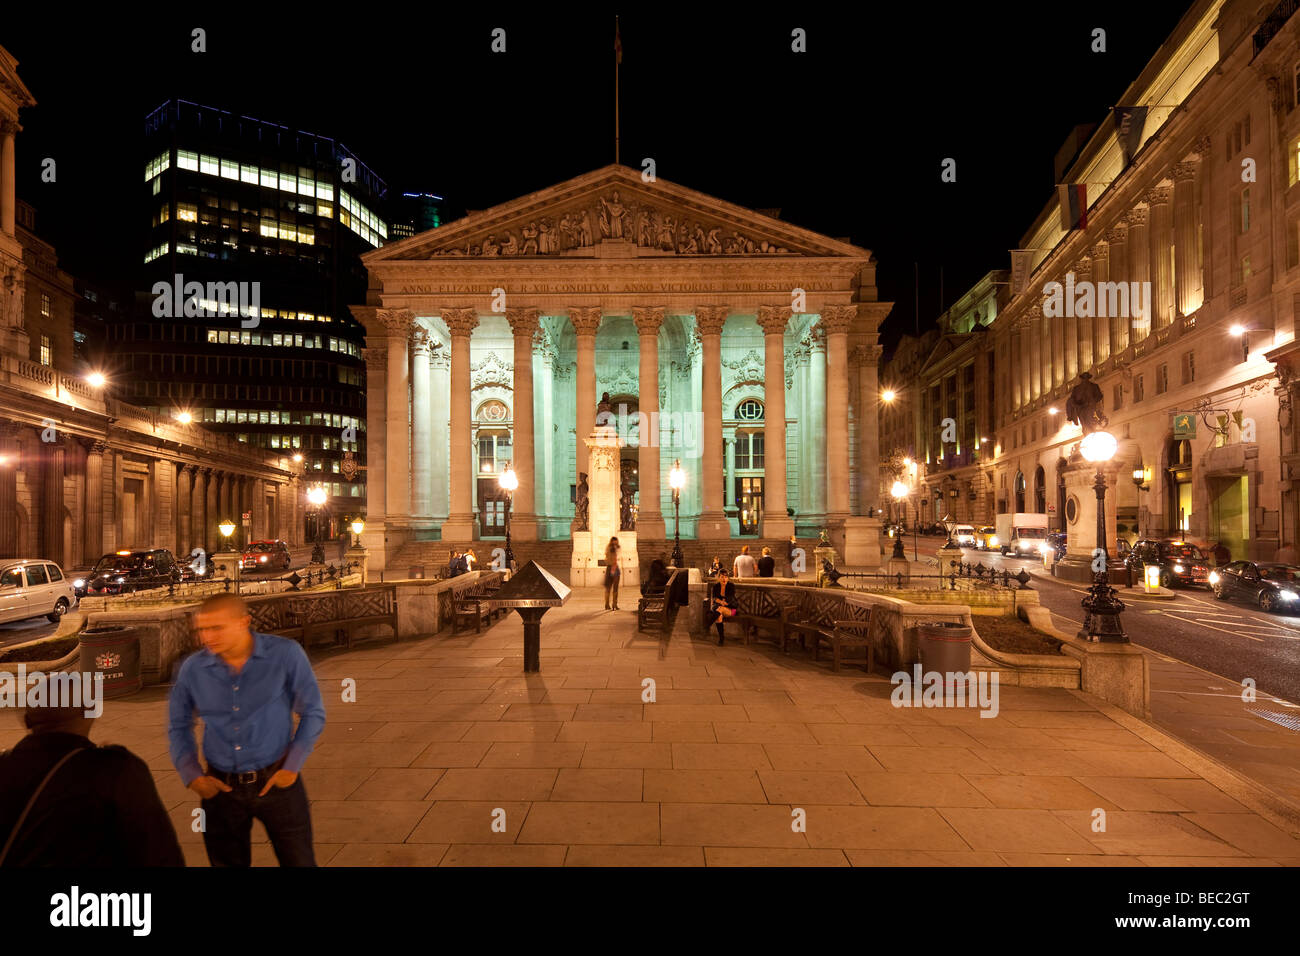 The Royal Exchange,  Cornhill and Threadneedle Street, London, England, UK - Stock Image